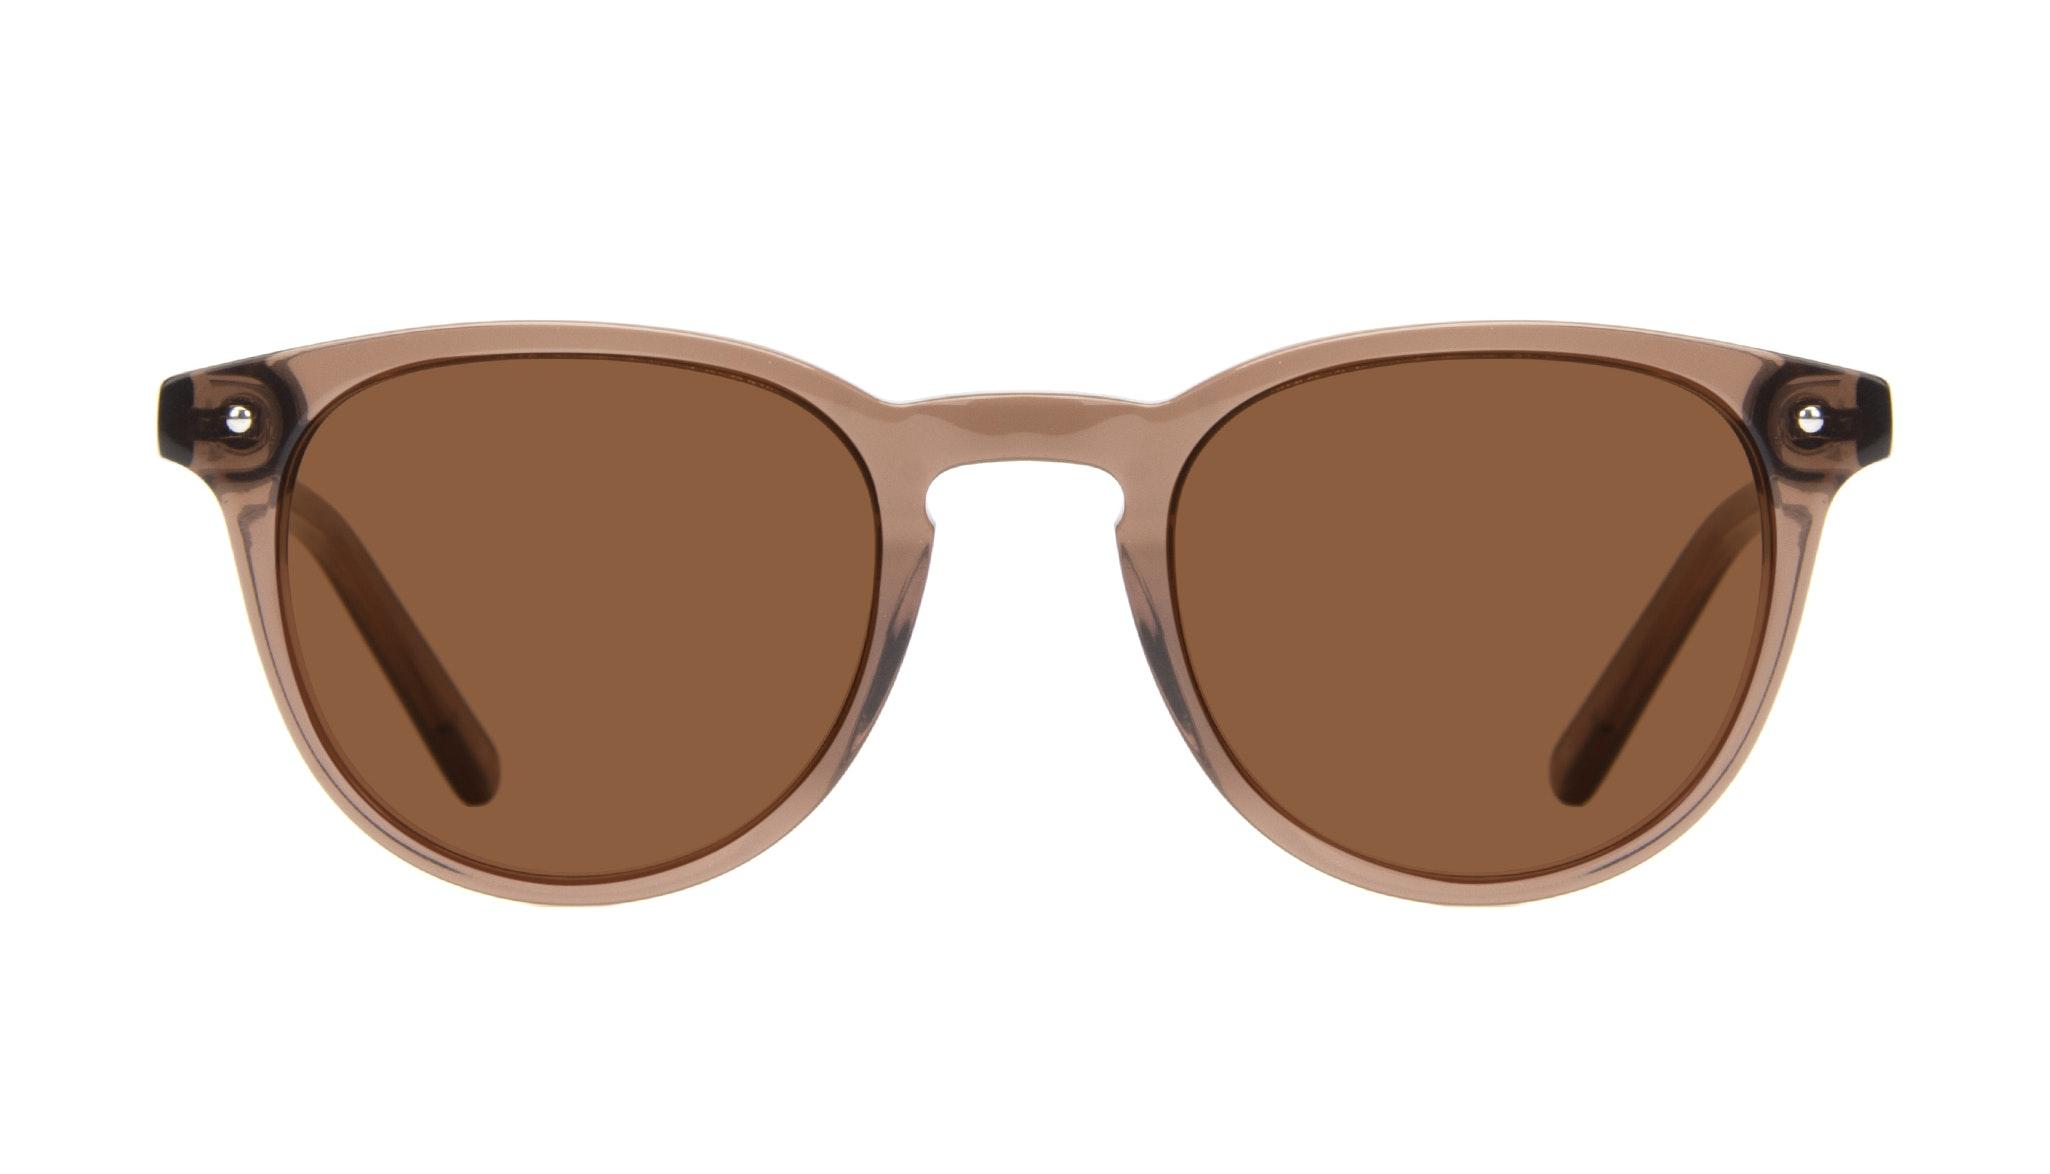 Affordable Fashion Glasses Round Sunglasses Men Cult Terra